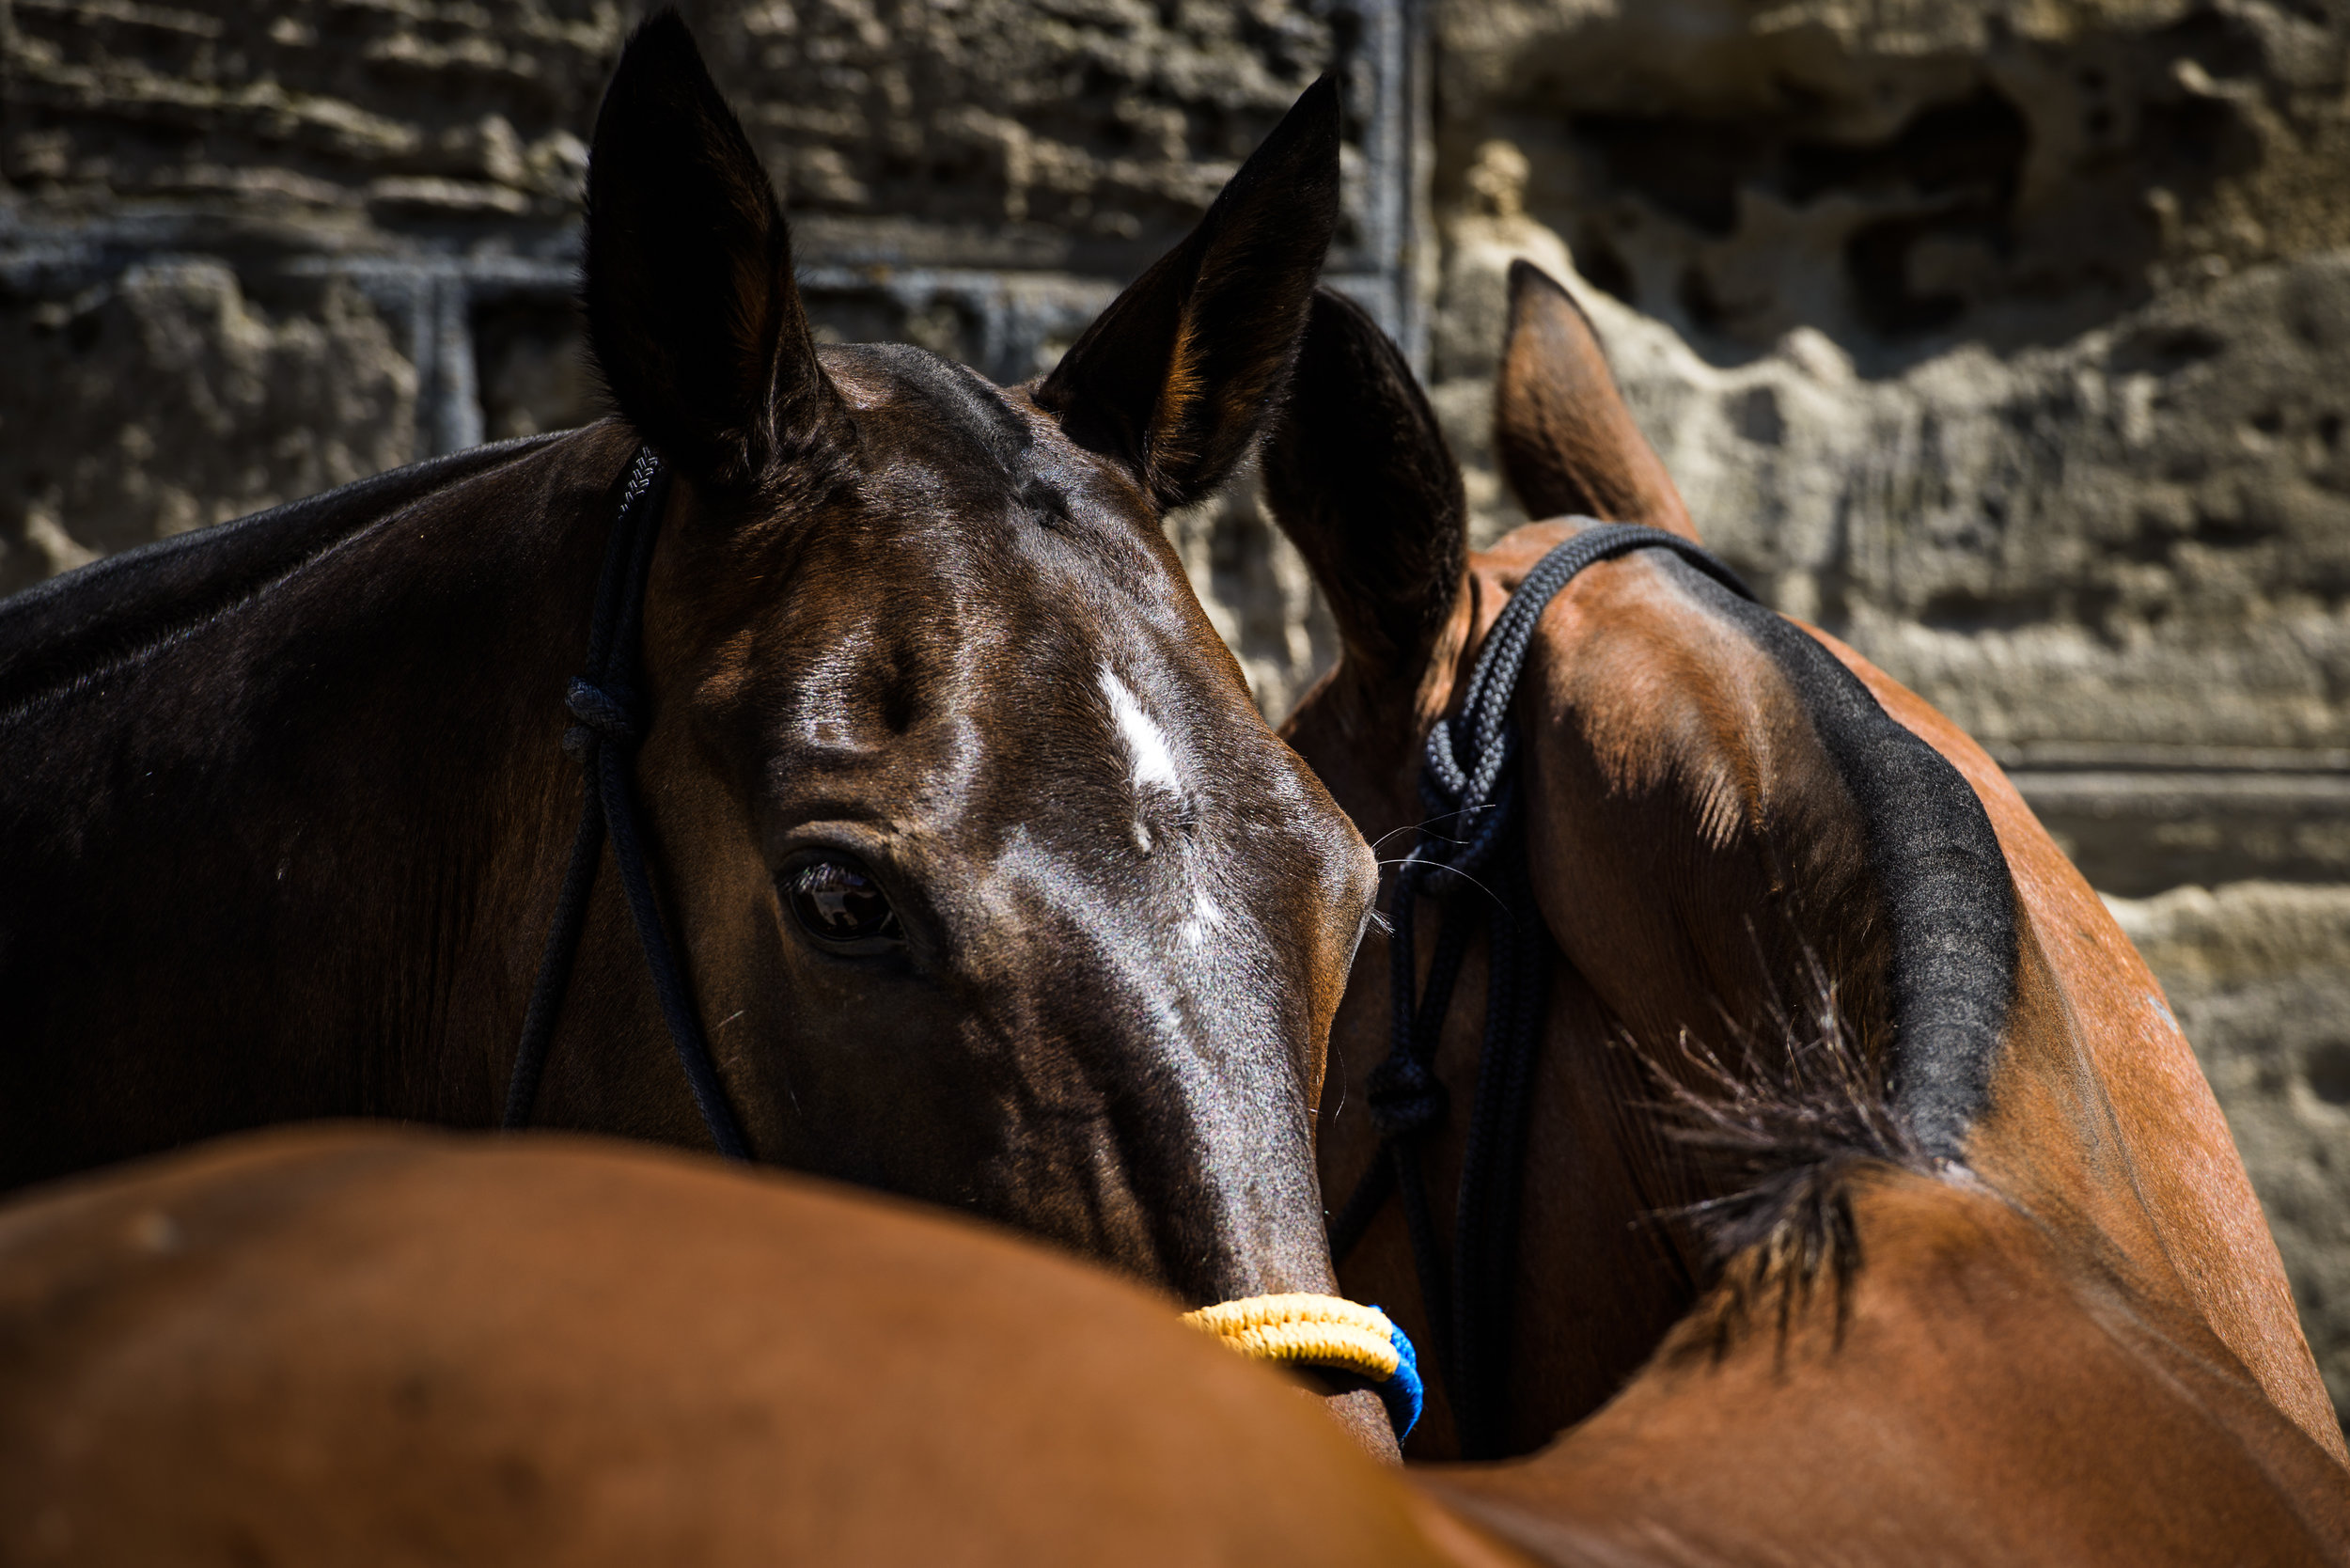 HORSE-2018.JPG